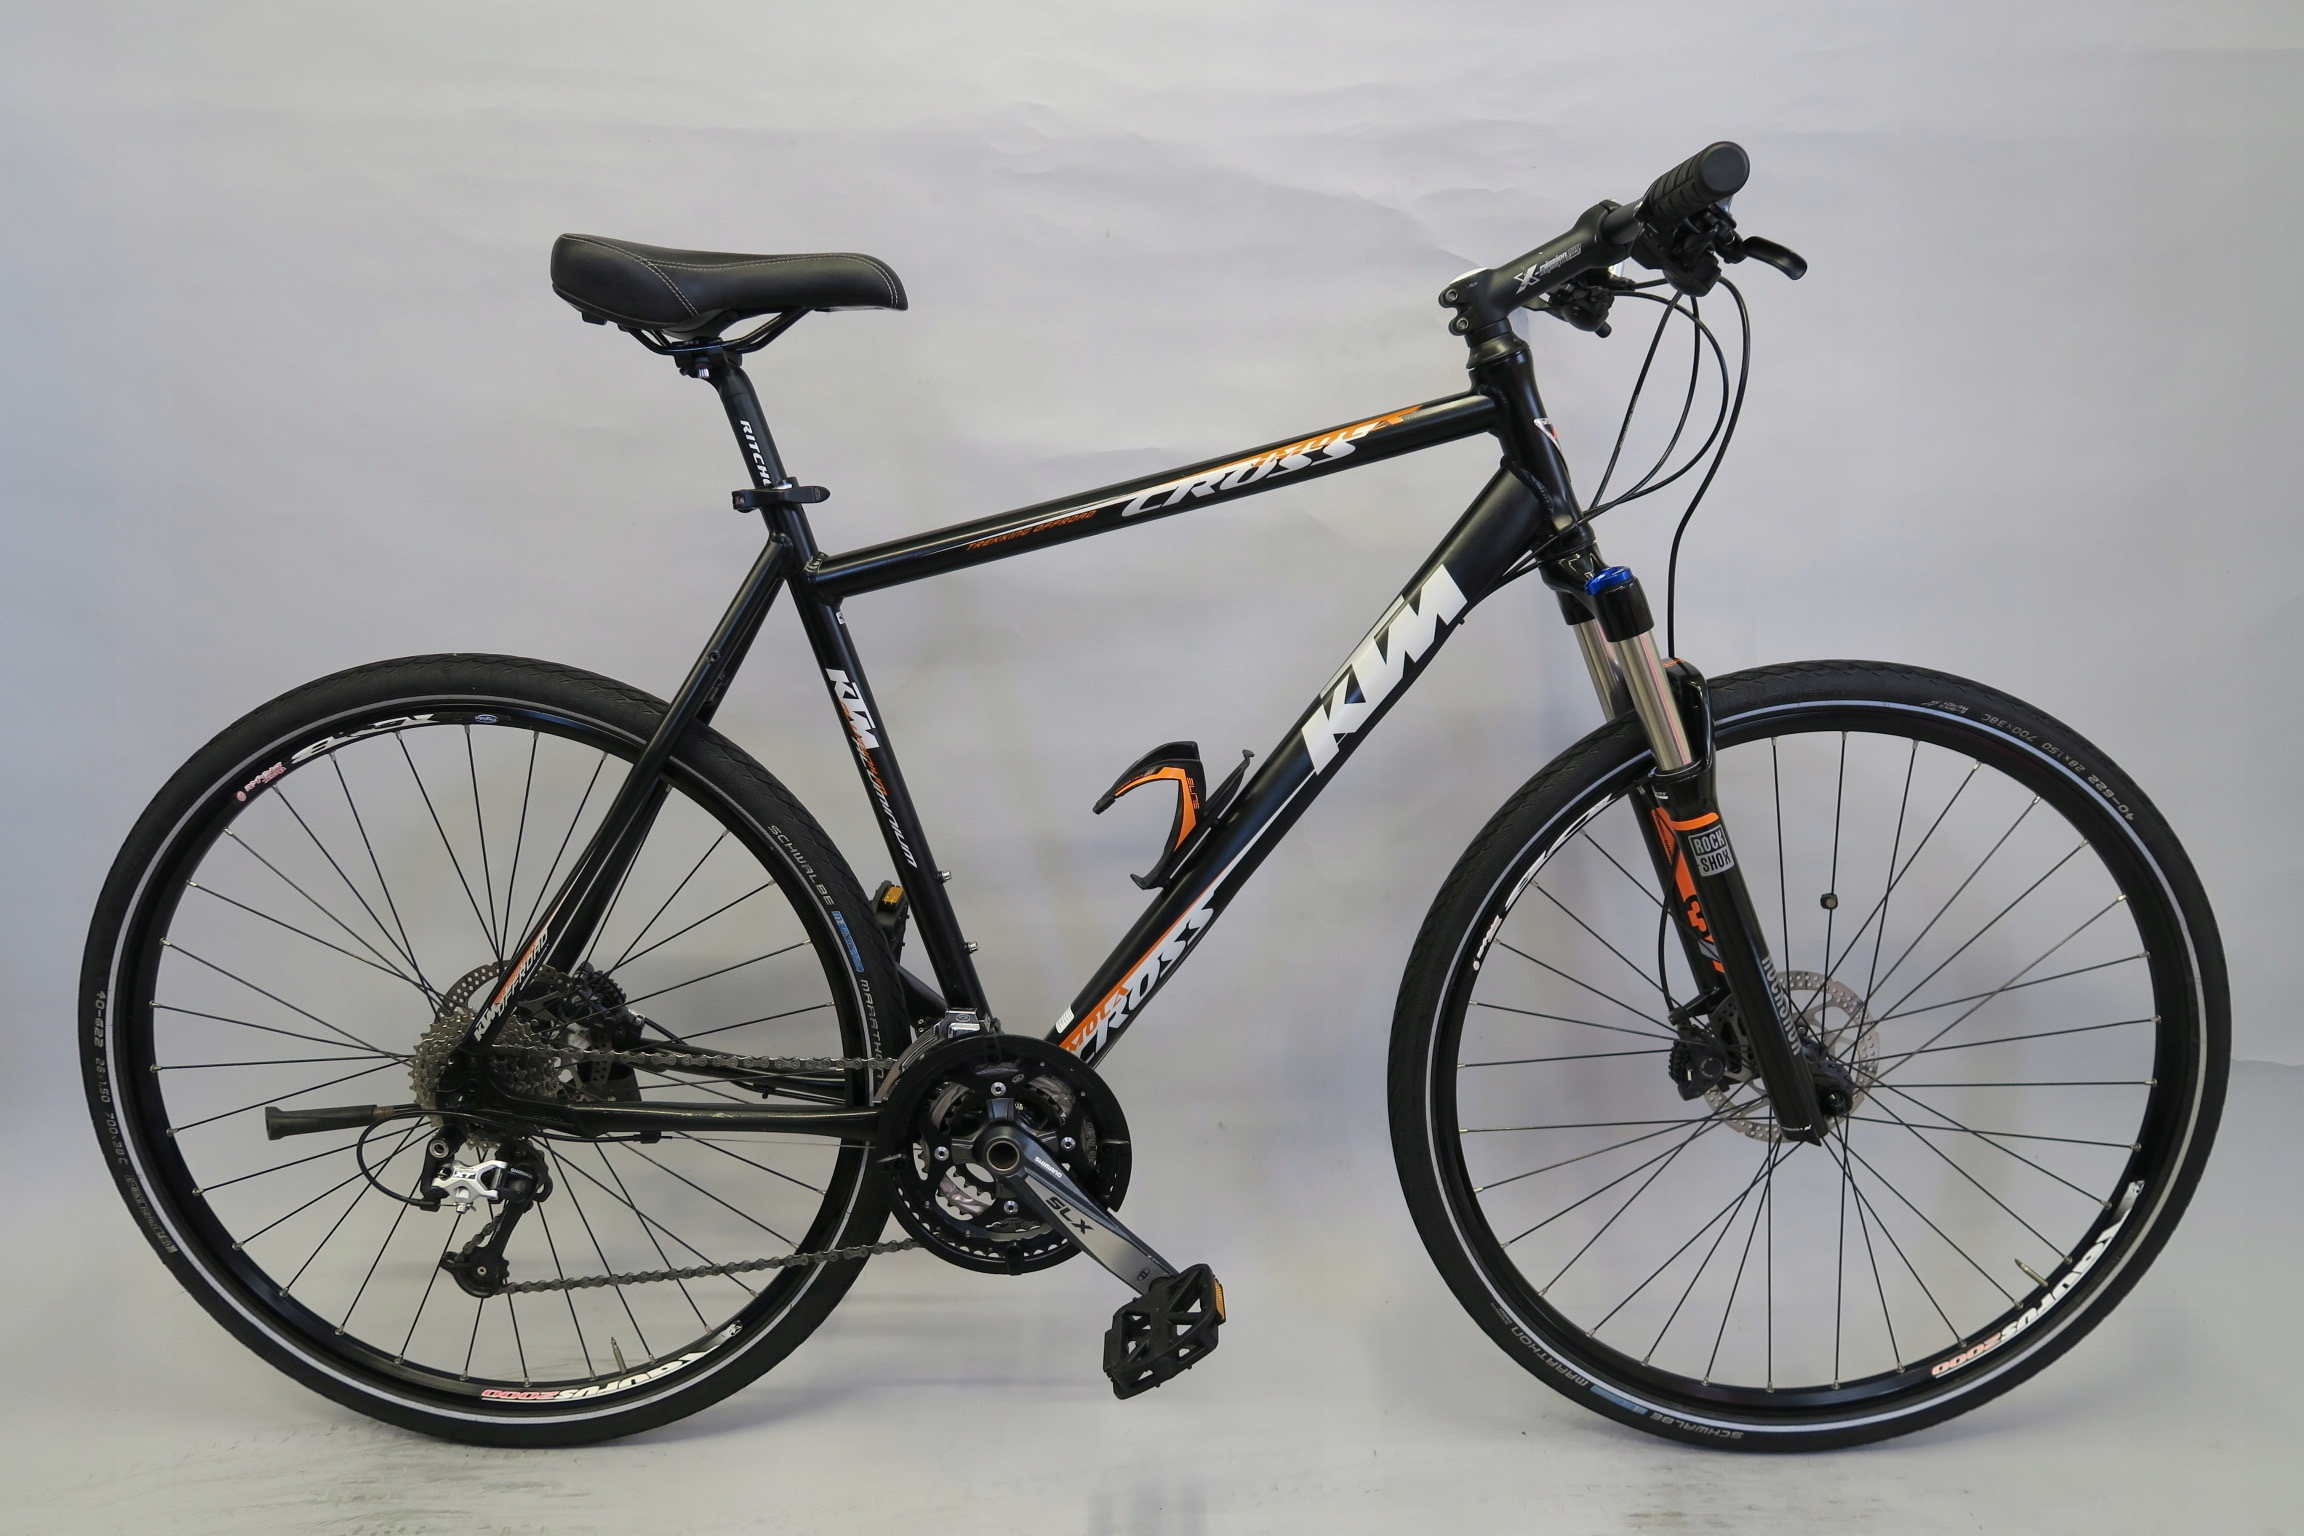 Rower crossowy KTM Imola XT SLX ROCK SHOX